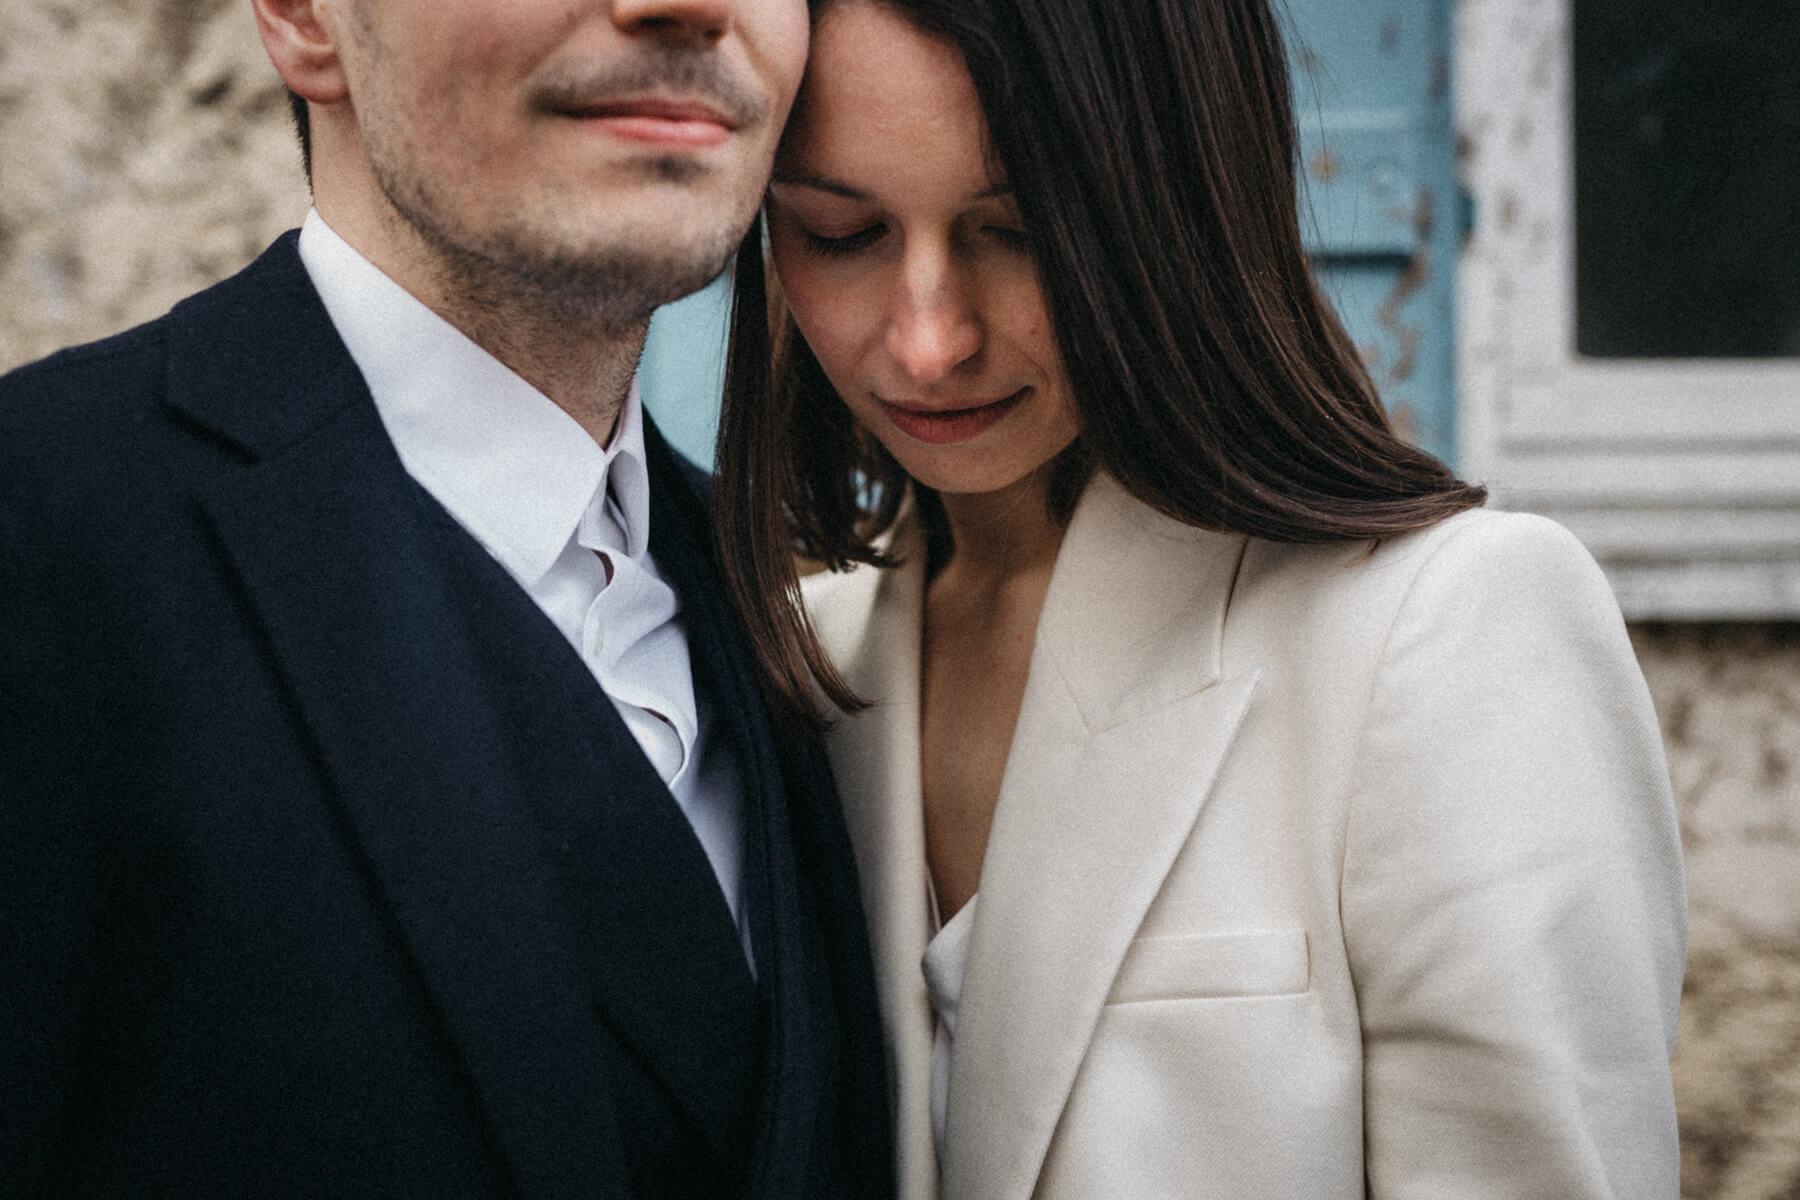 raissa simon fotografie urban civil wedding munich 019 - Nikolija + Niko